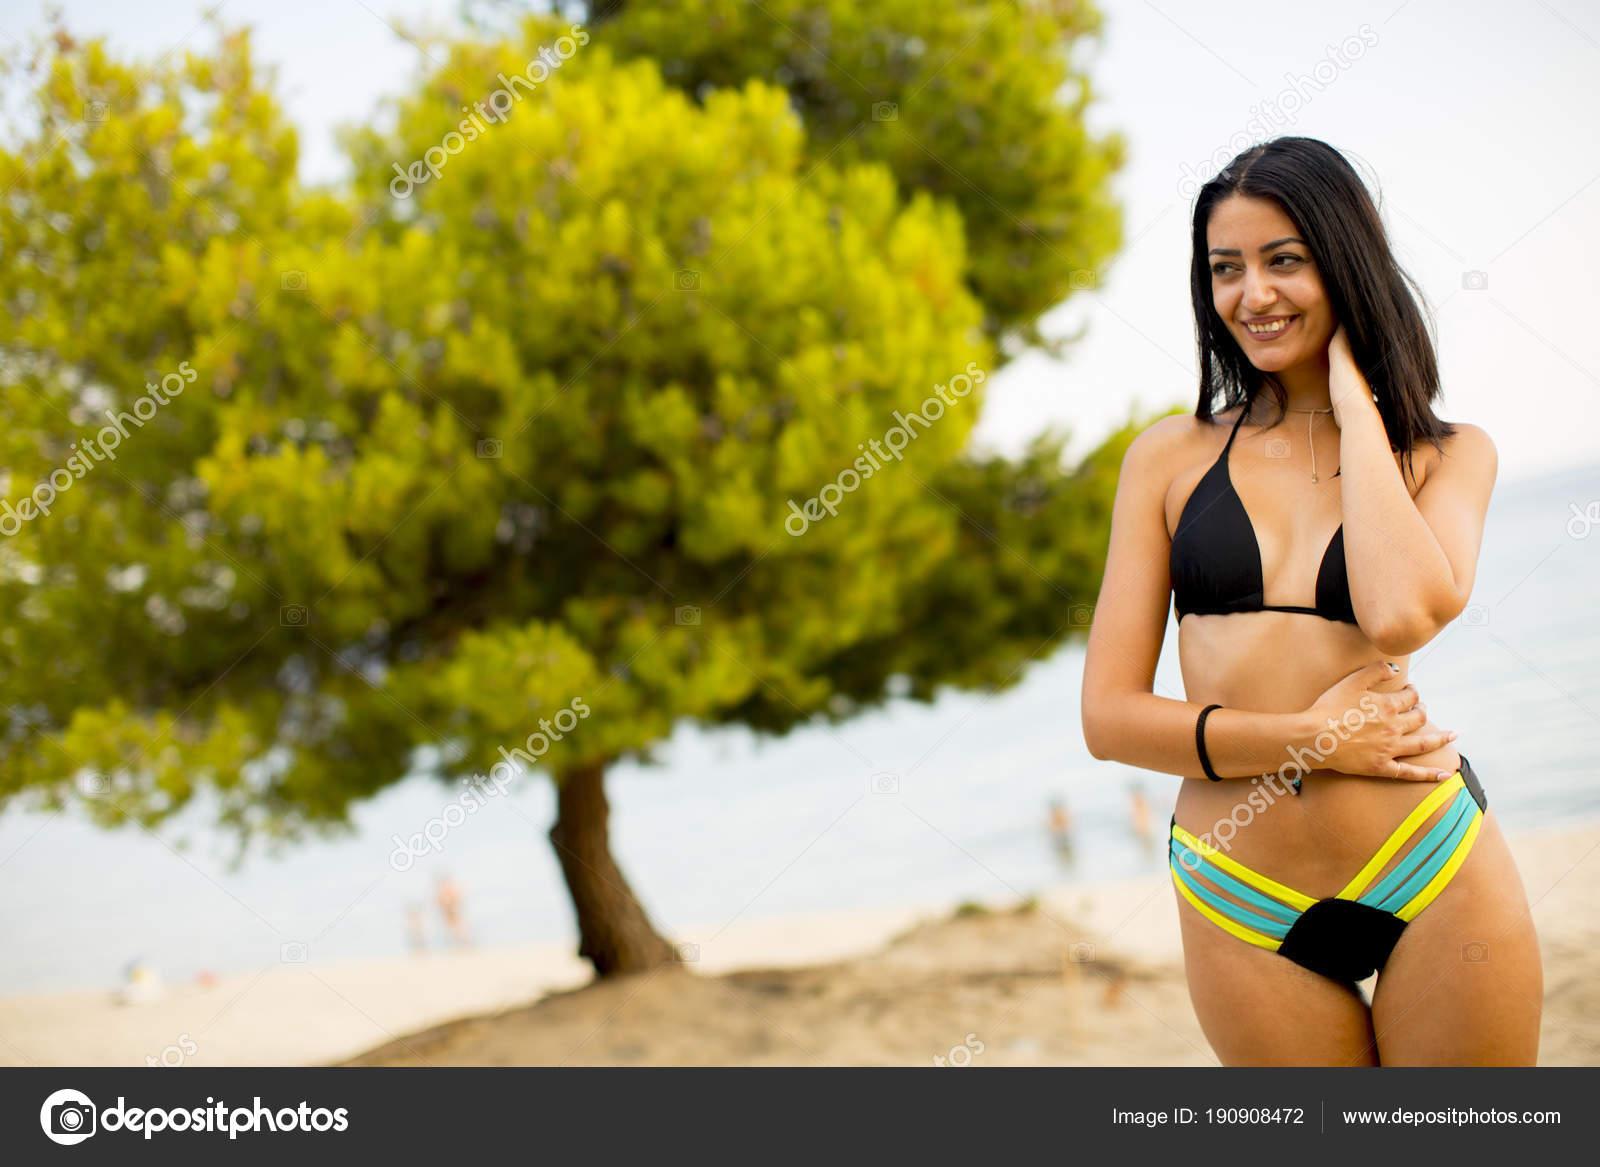 Very pity free beach bikini photographs